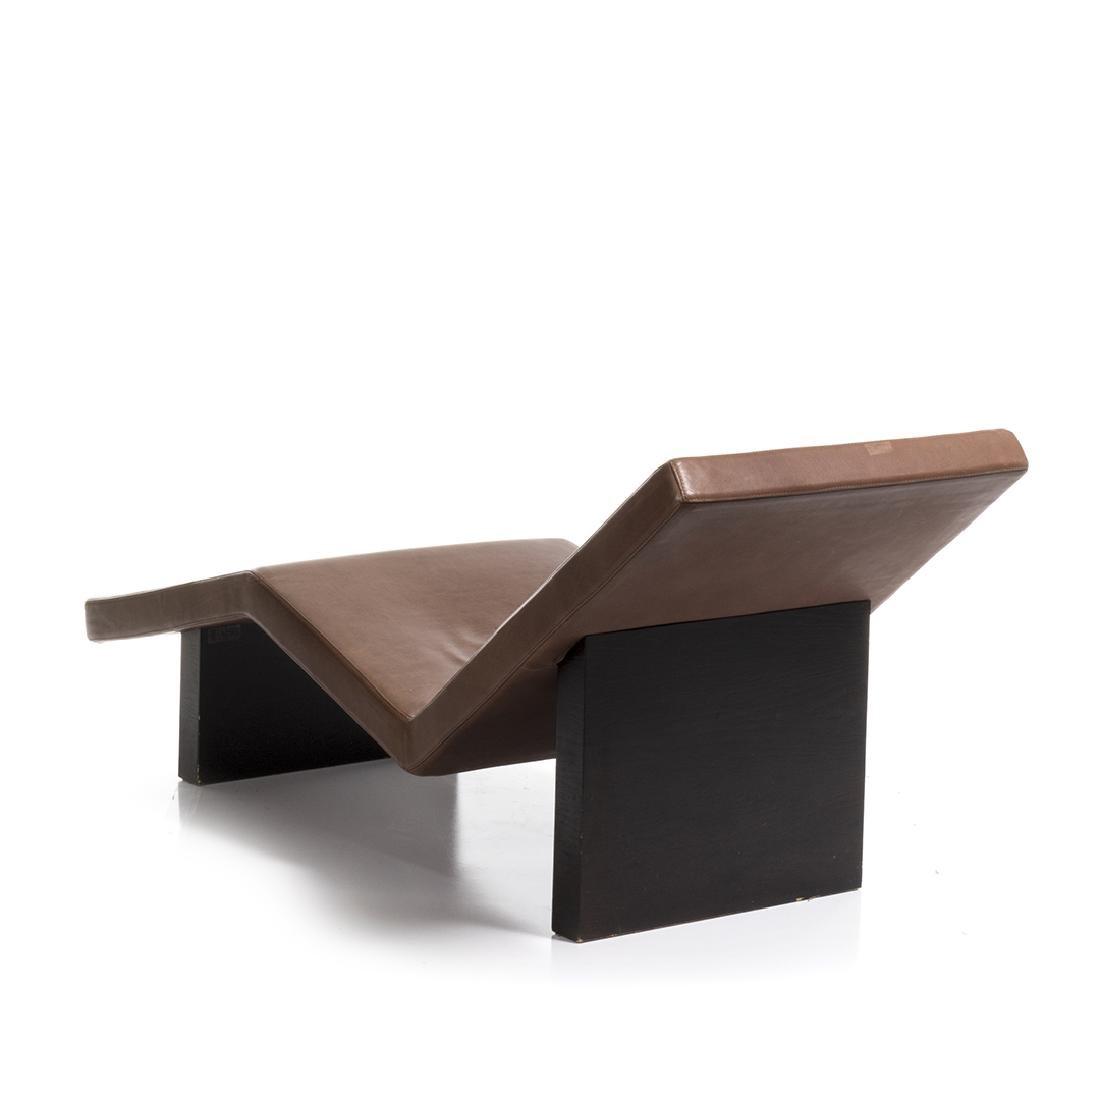 Armani Casa Chaise Lounge - 2